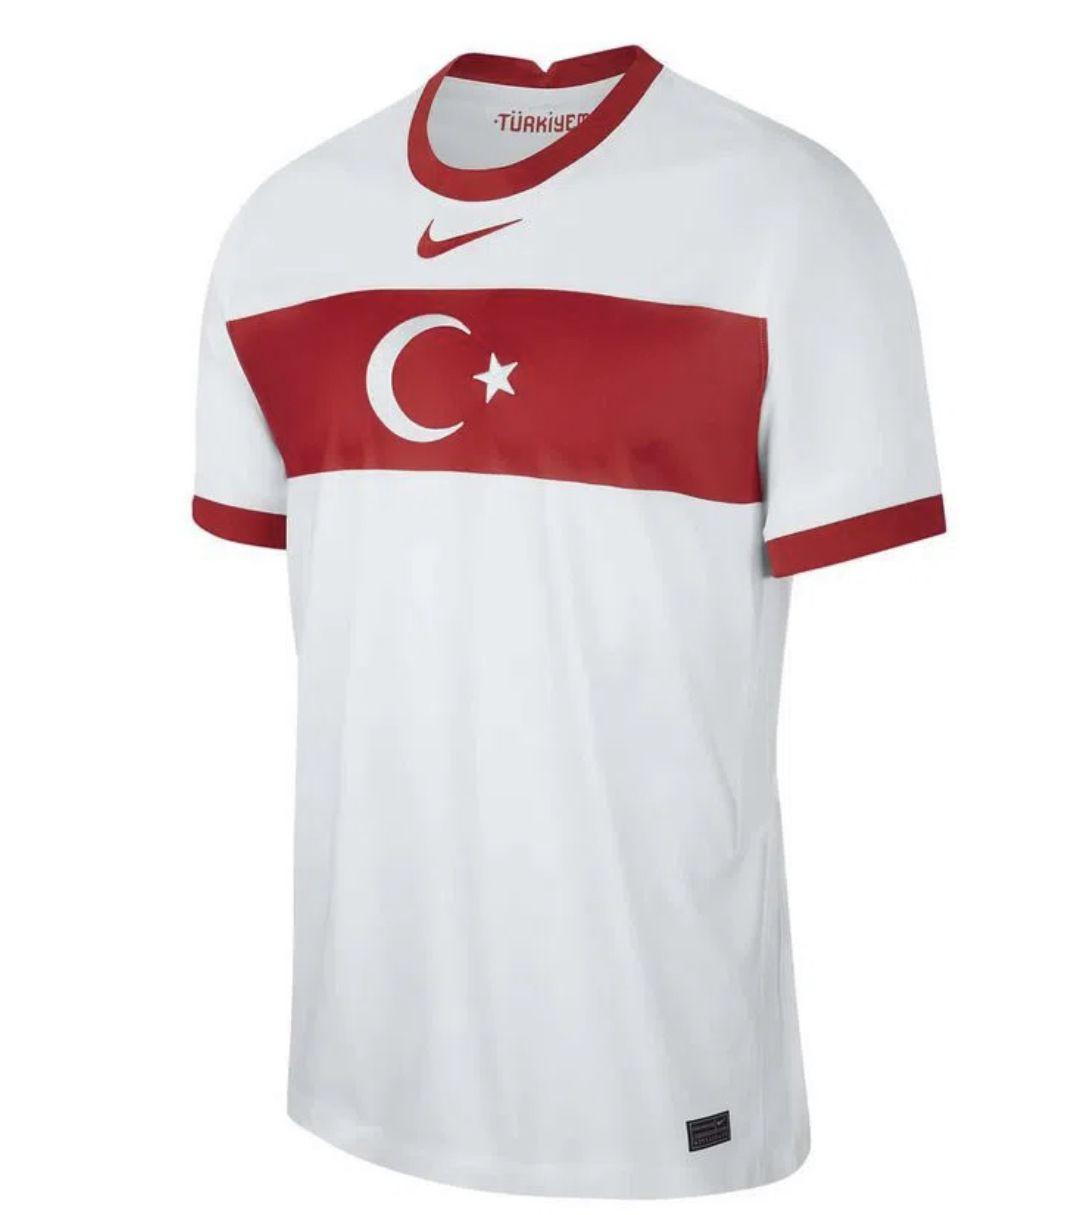 Nike Kinder Trikot Portugal und Türkei für je 12,89€ (statt 30€)